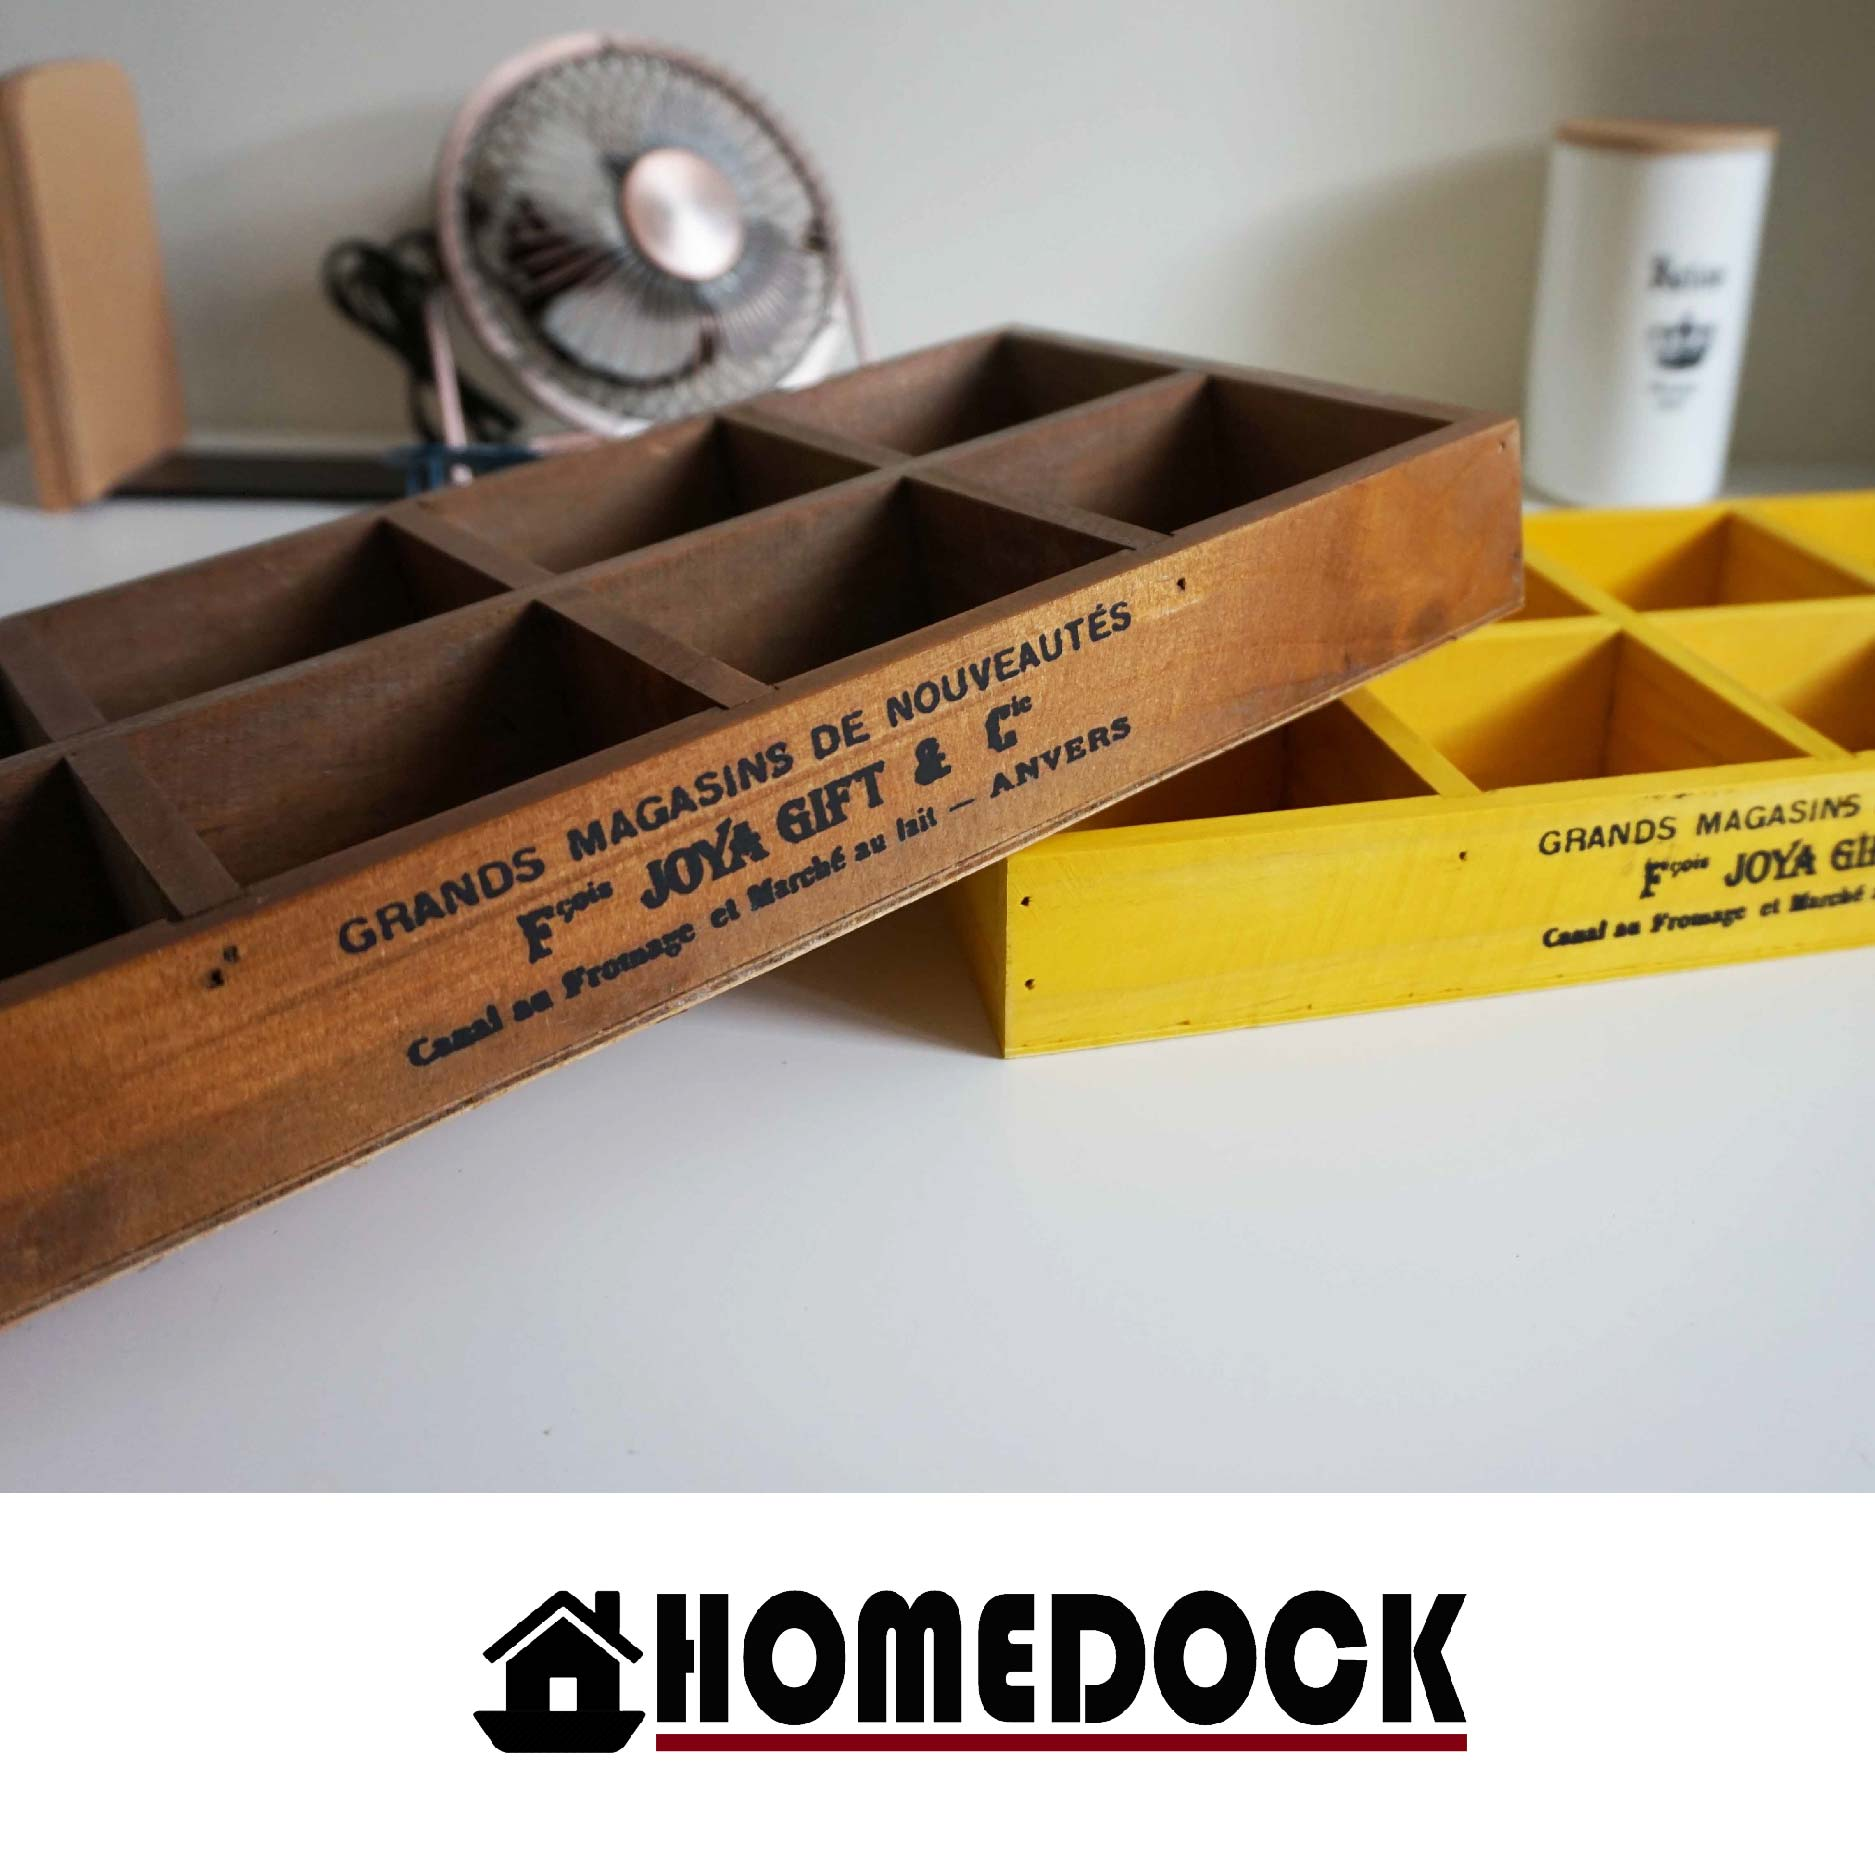 HOMEDOCK-原木質感8格桌面收納盒 /筆筒/置物盒/Zakka/雜貨/原木製/層格櫃/文具筒/雙層